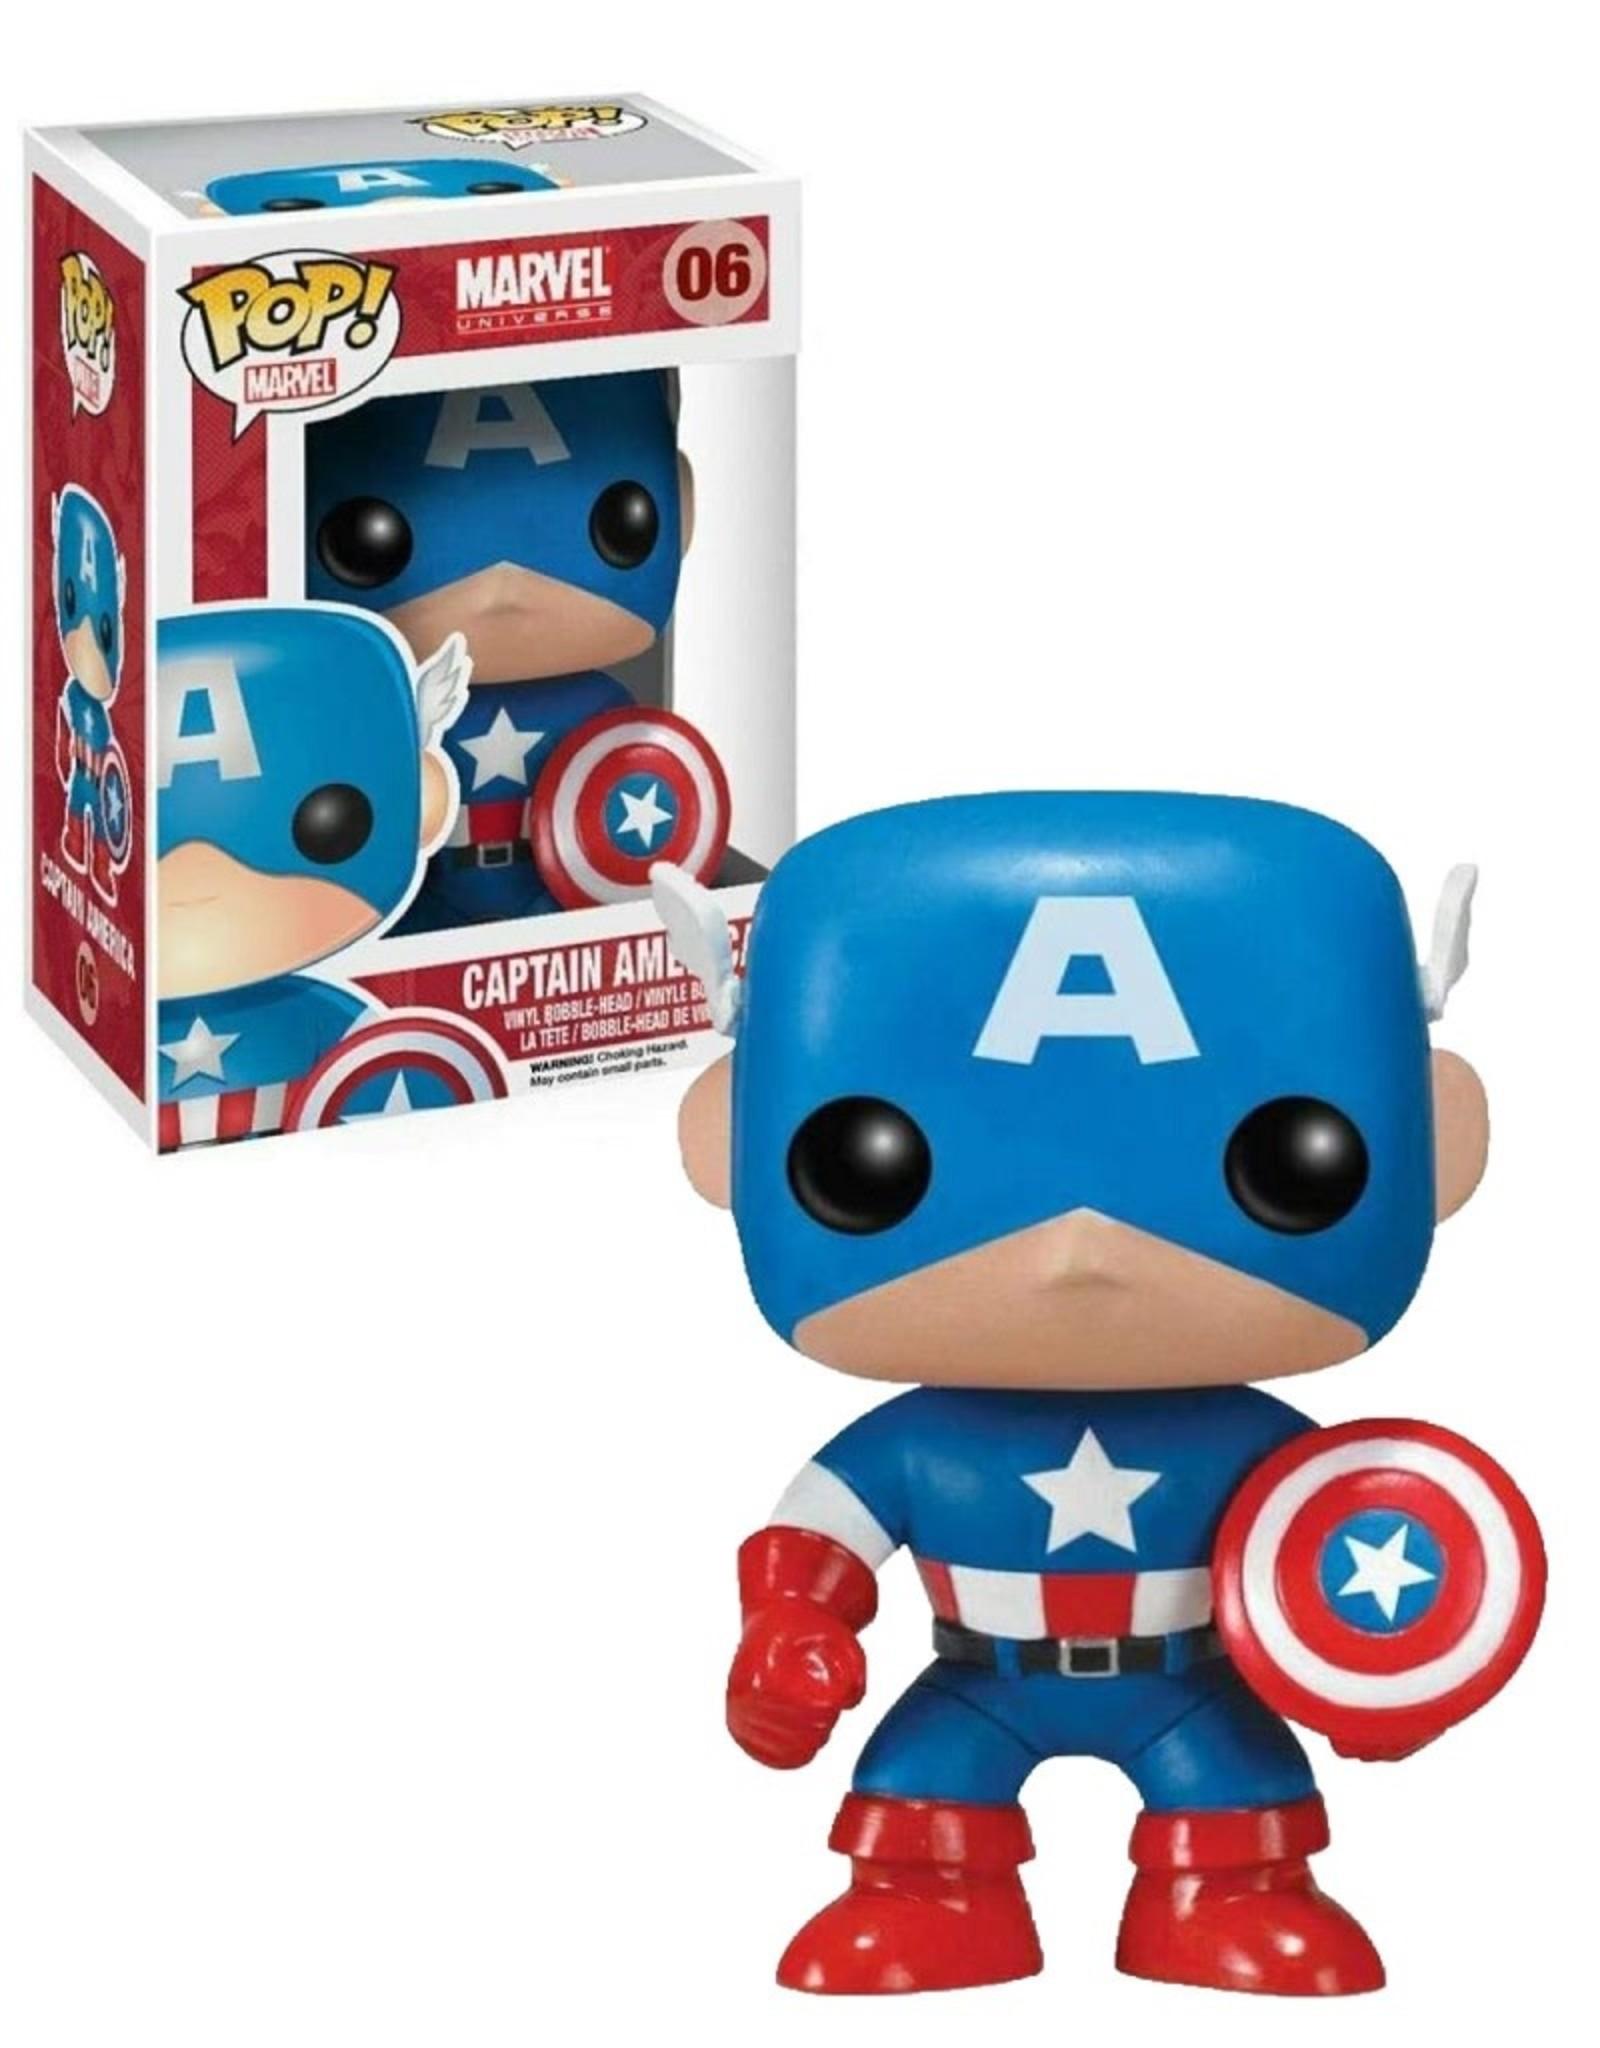 Marvel Marvel 06 ( Funko Pop ) Captain America